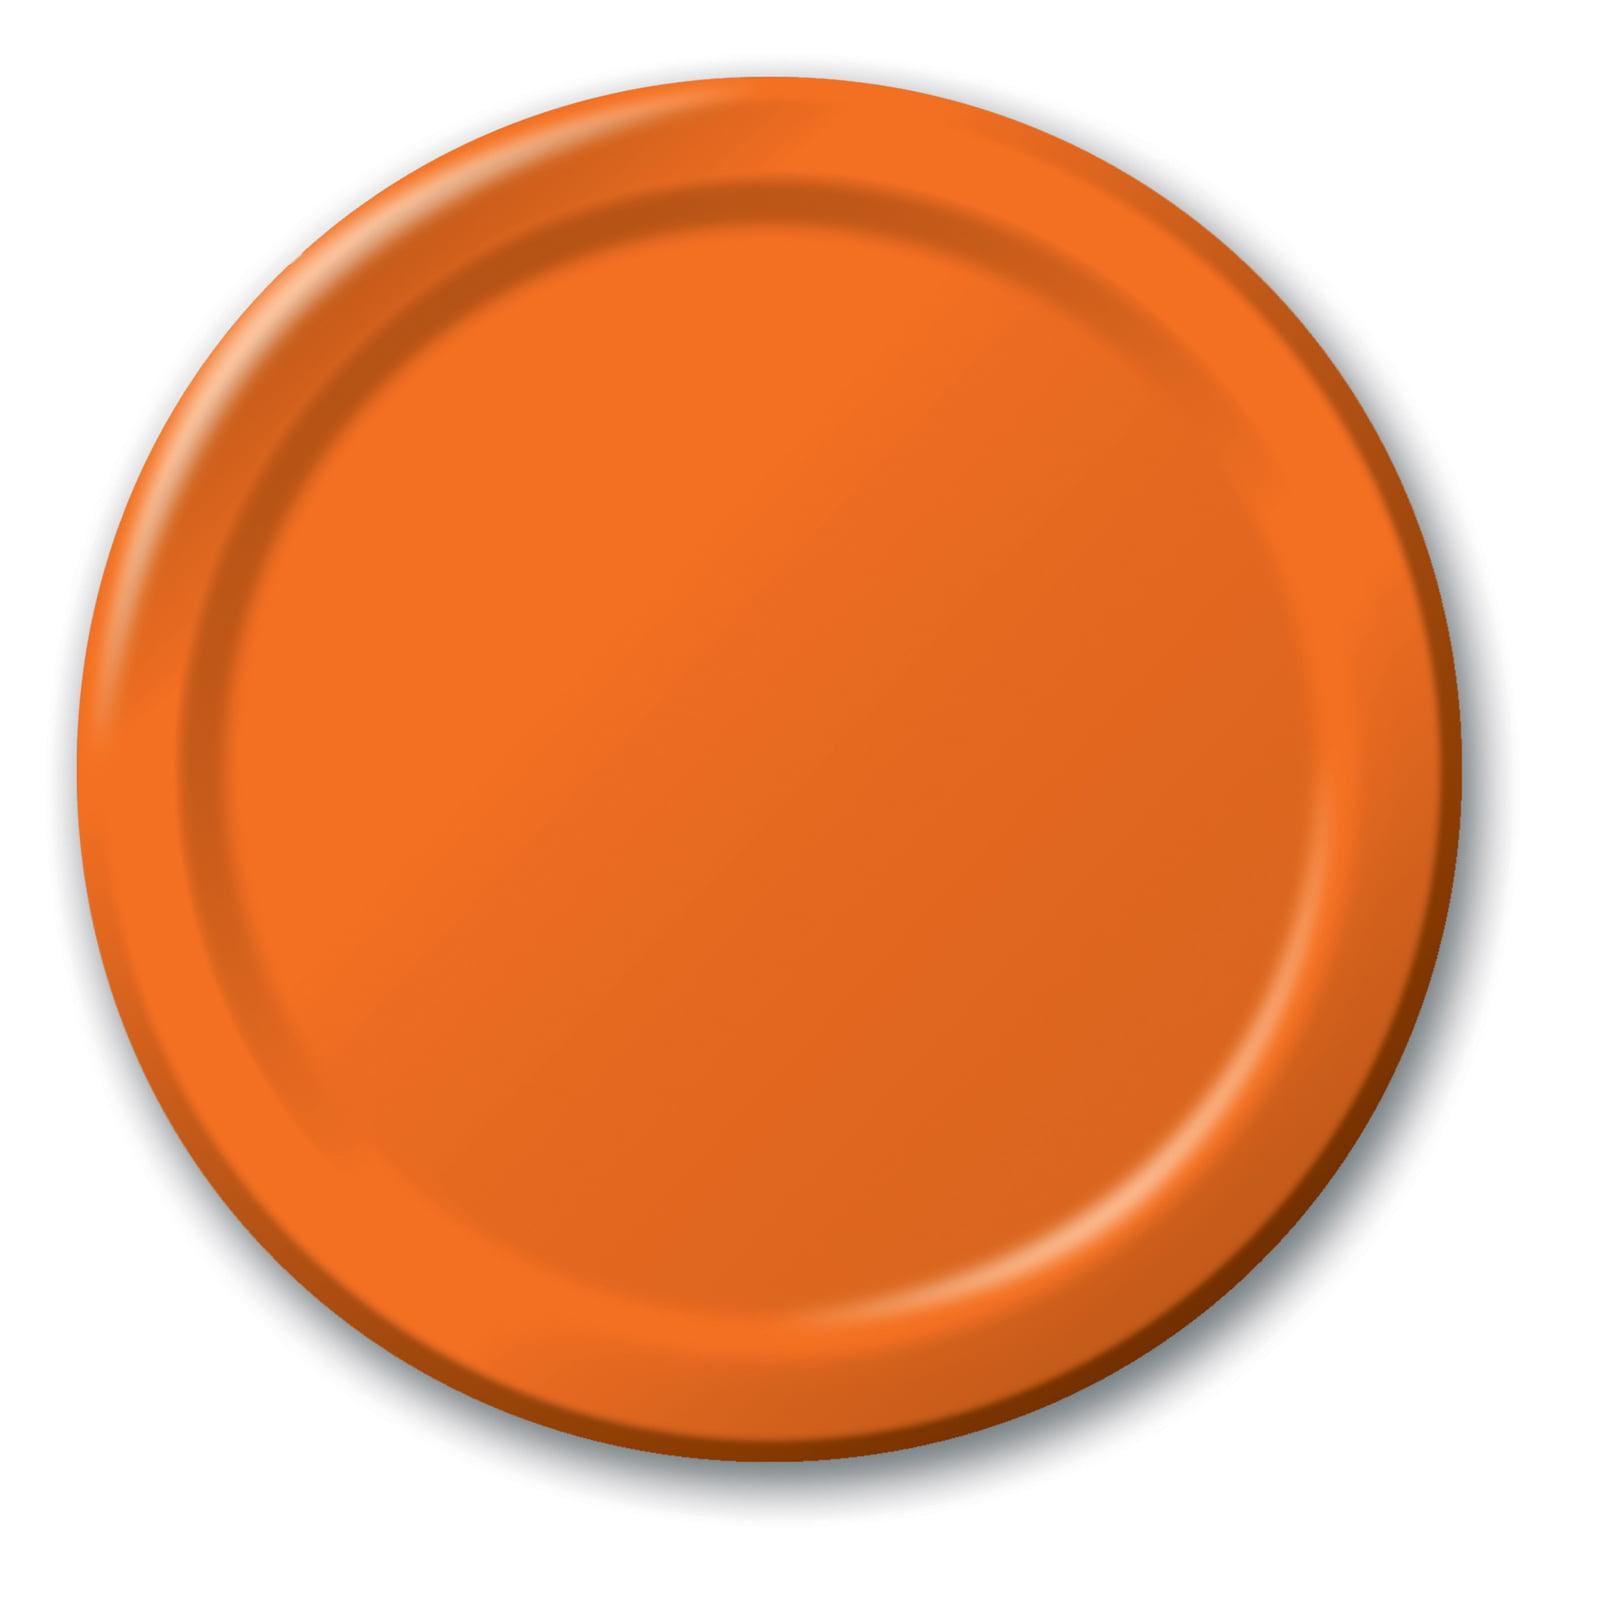 sc 1 st  Walmart.com & Dinner Plate - Orange (24 Count) - Walmart.com